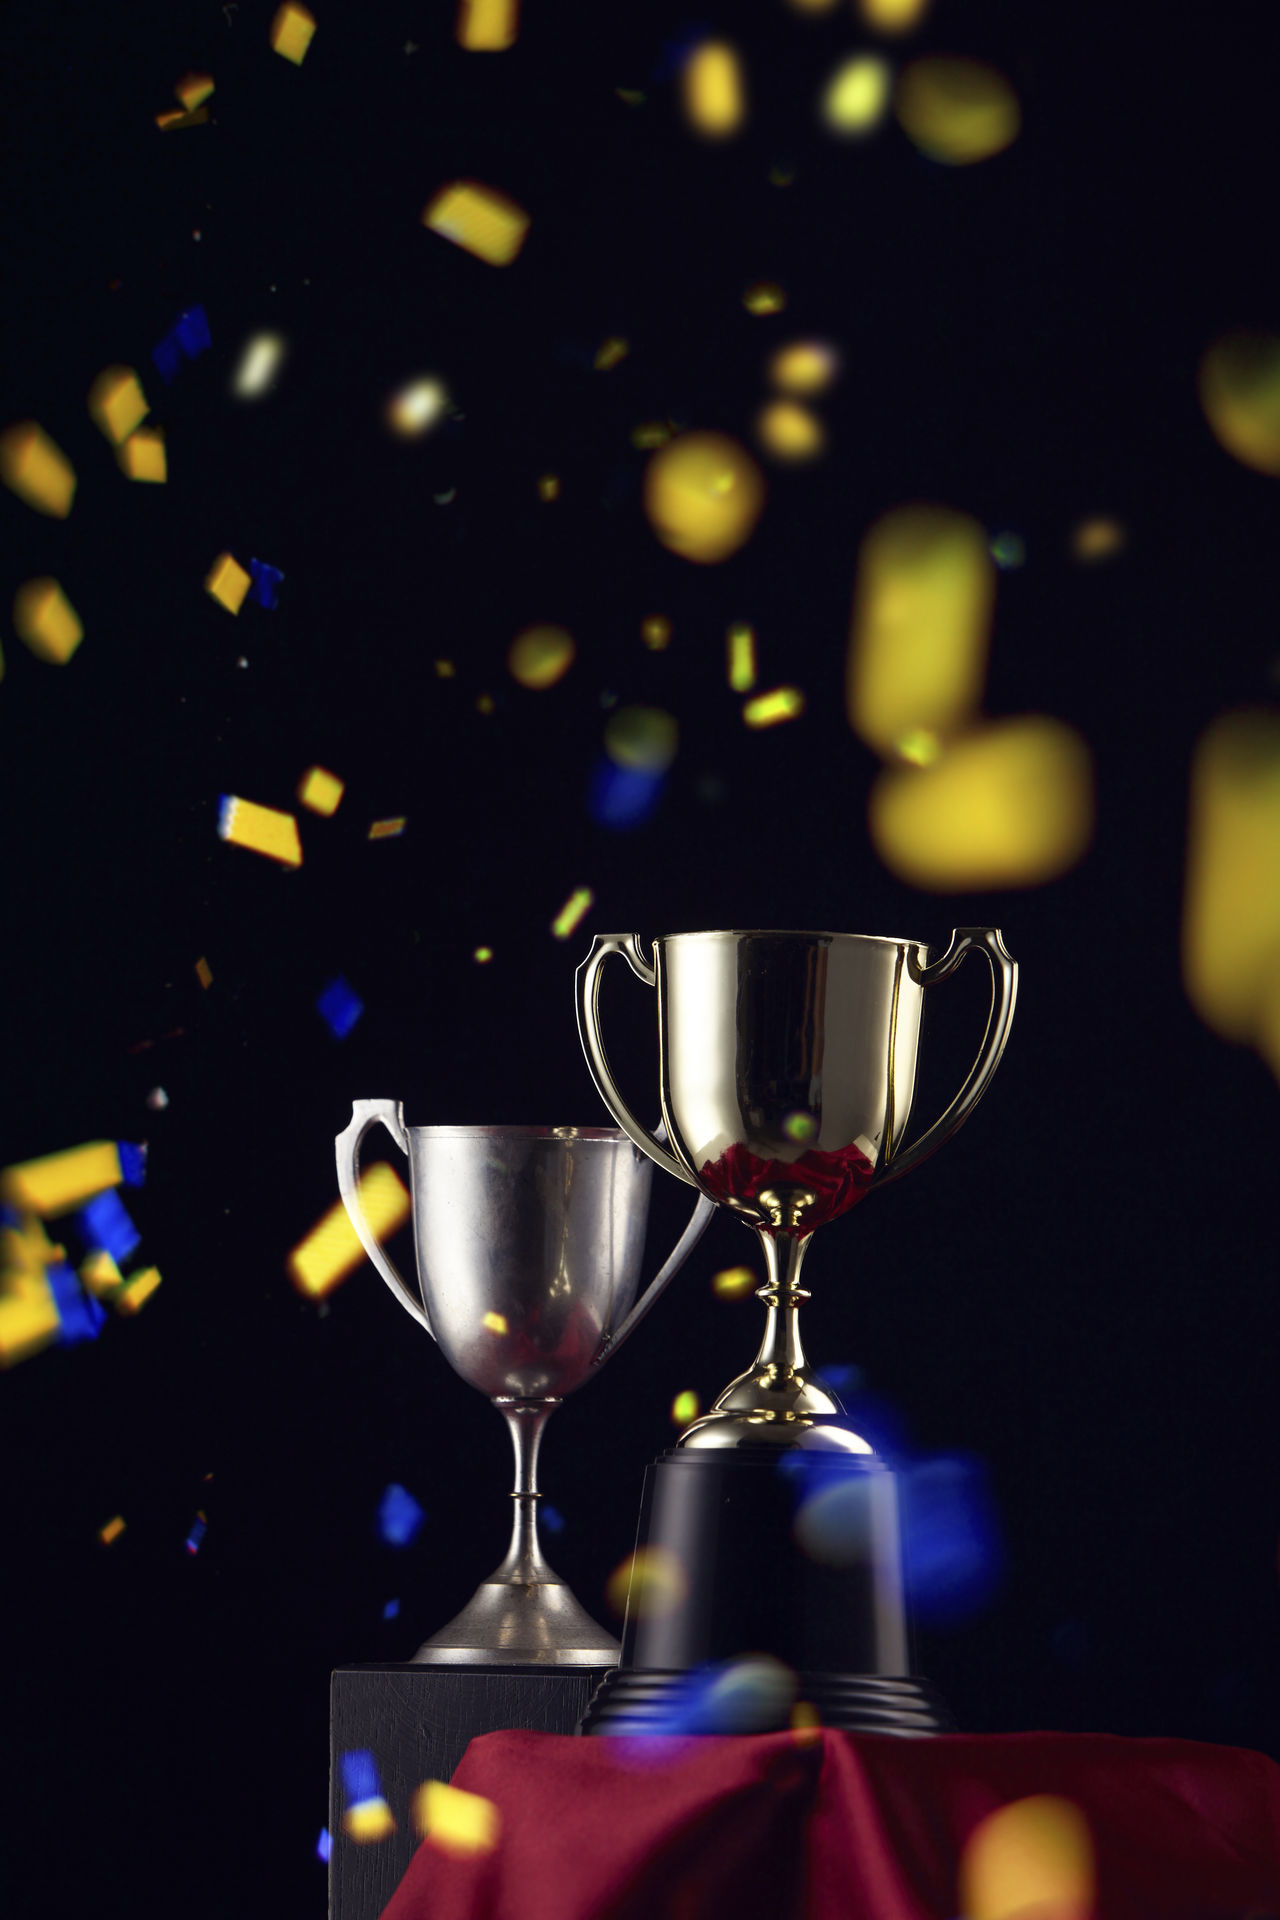 trophy on the black background Achieve Achievement AWARD Bestoftheday Black Challenge Championship Concept Contest Determination Goal Honor Inspiration Light Motivation Place Pride Prize Reward Shiny Success Symbol Trophy Victory Winter